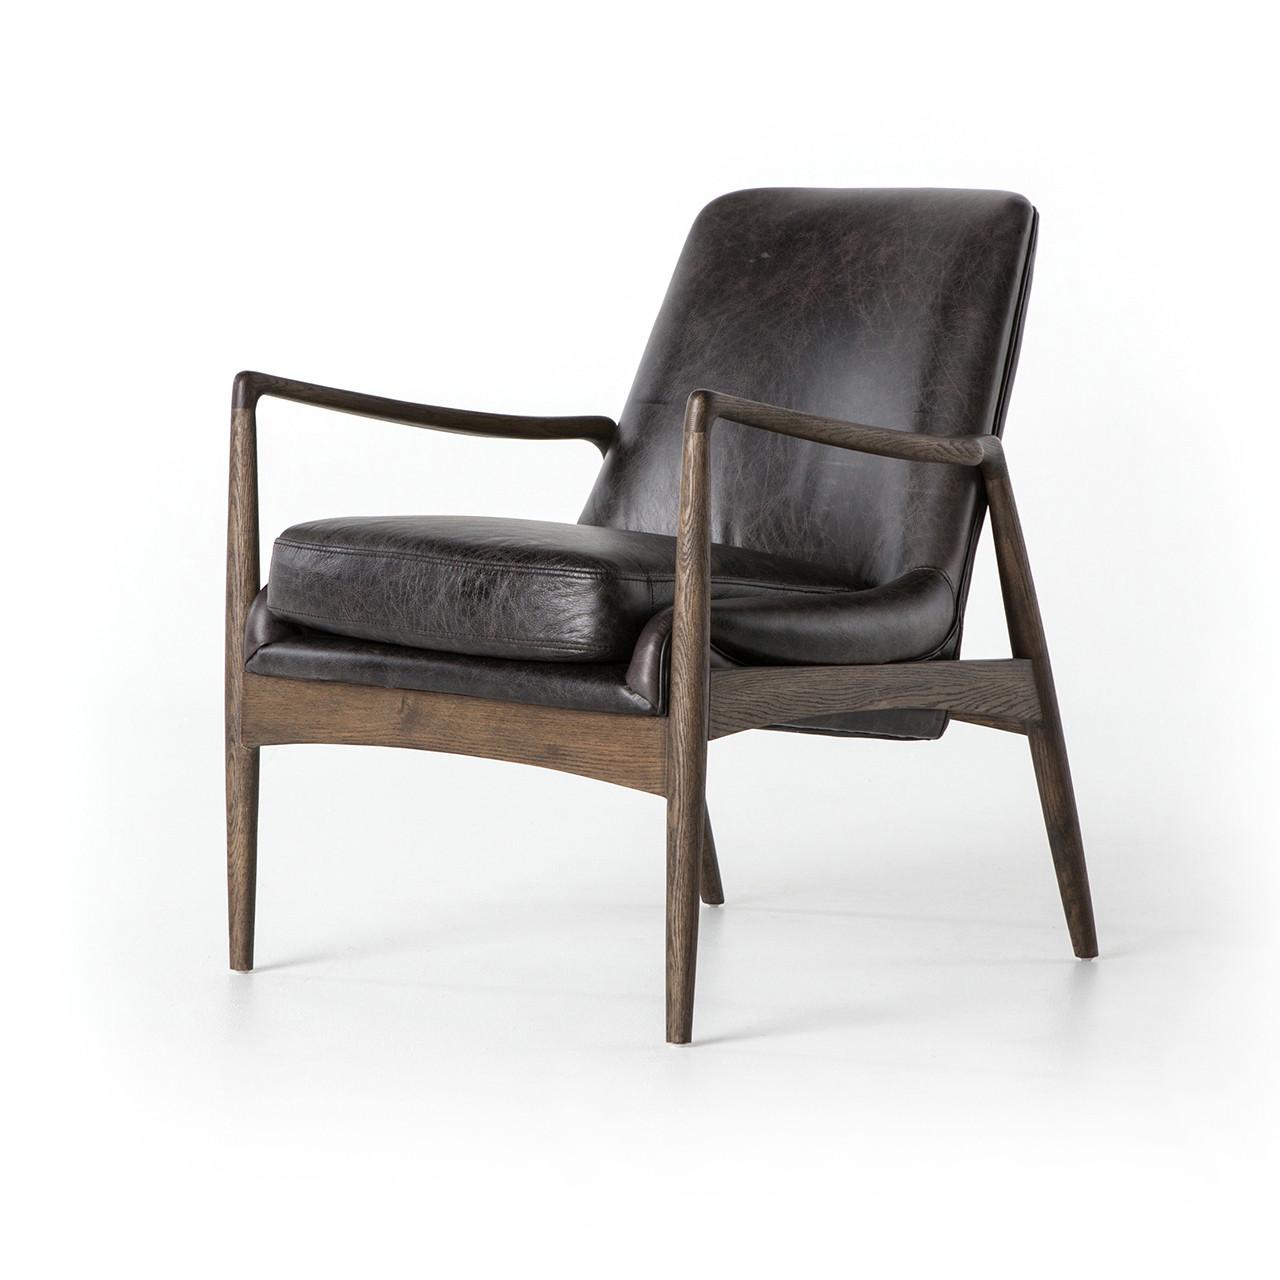 Braden Chair - 6 Color Options